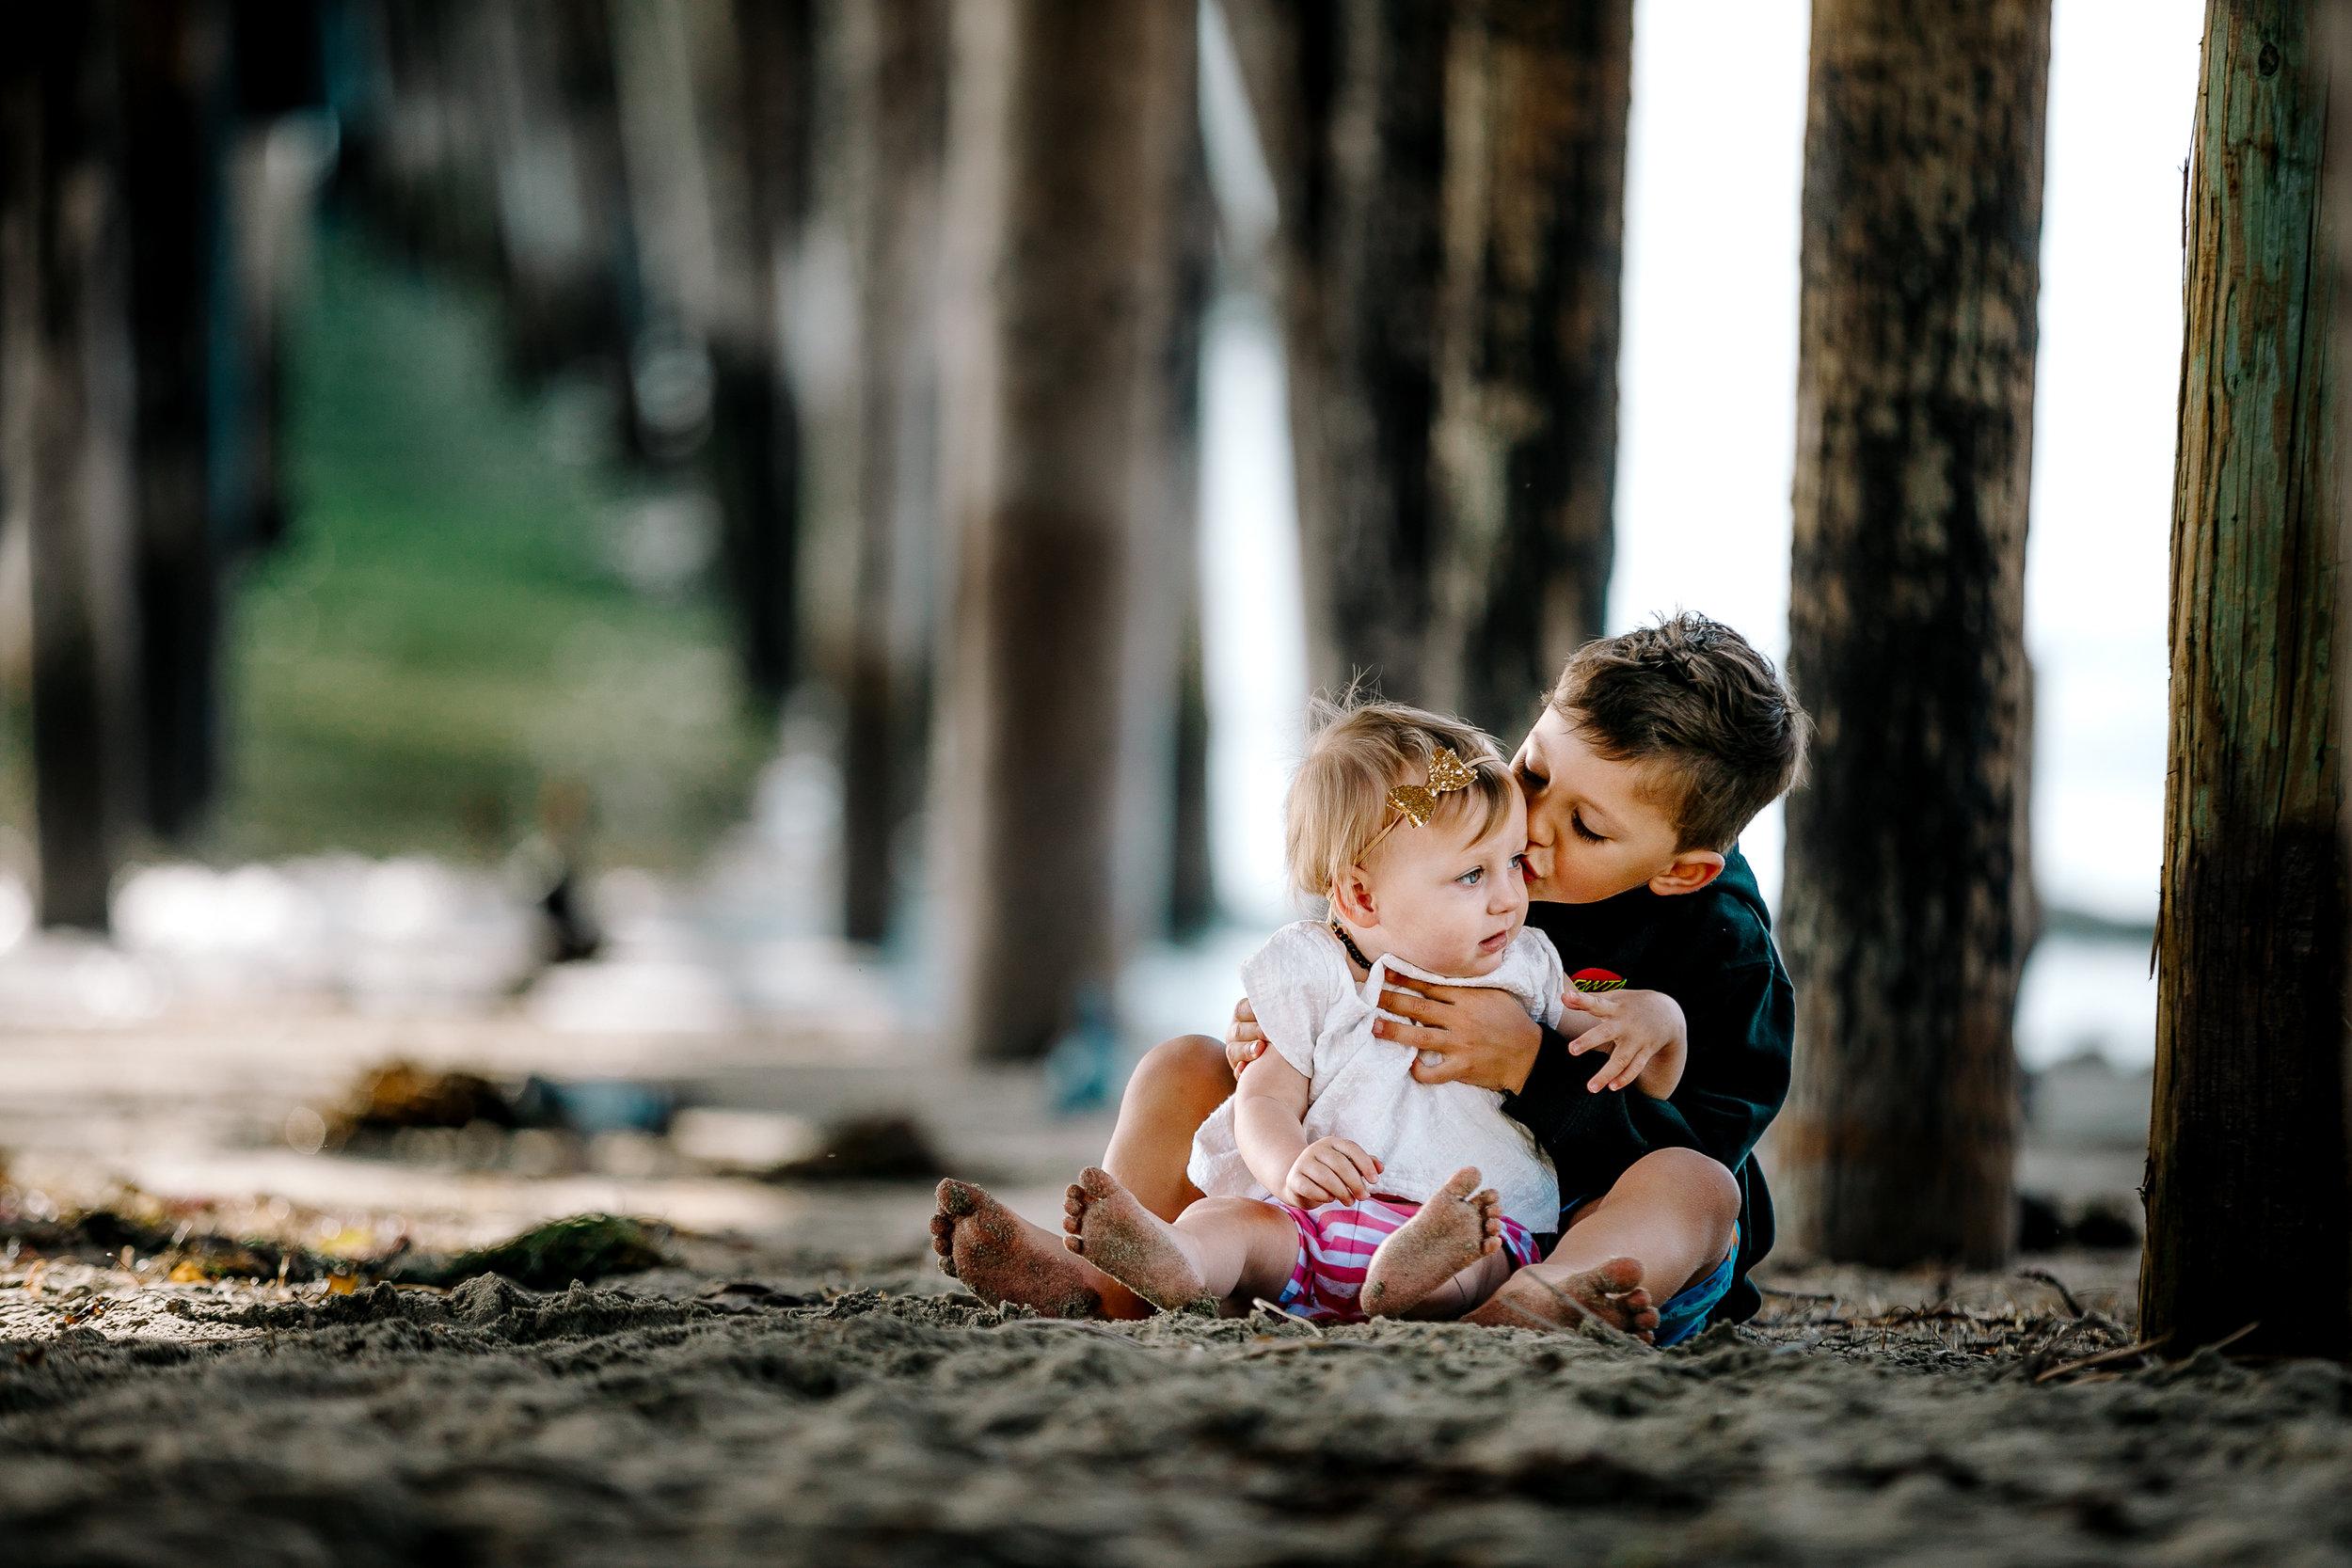 Archer Inspired Photography Lifestyle Family Capitola Beach California Documentary Photographer First Birthday Shoot-22.jpg